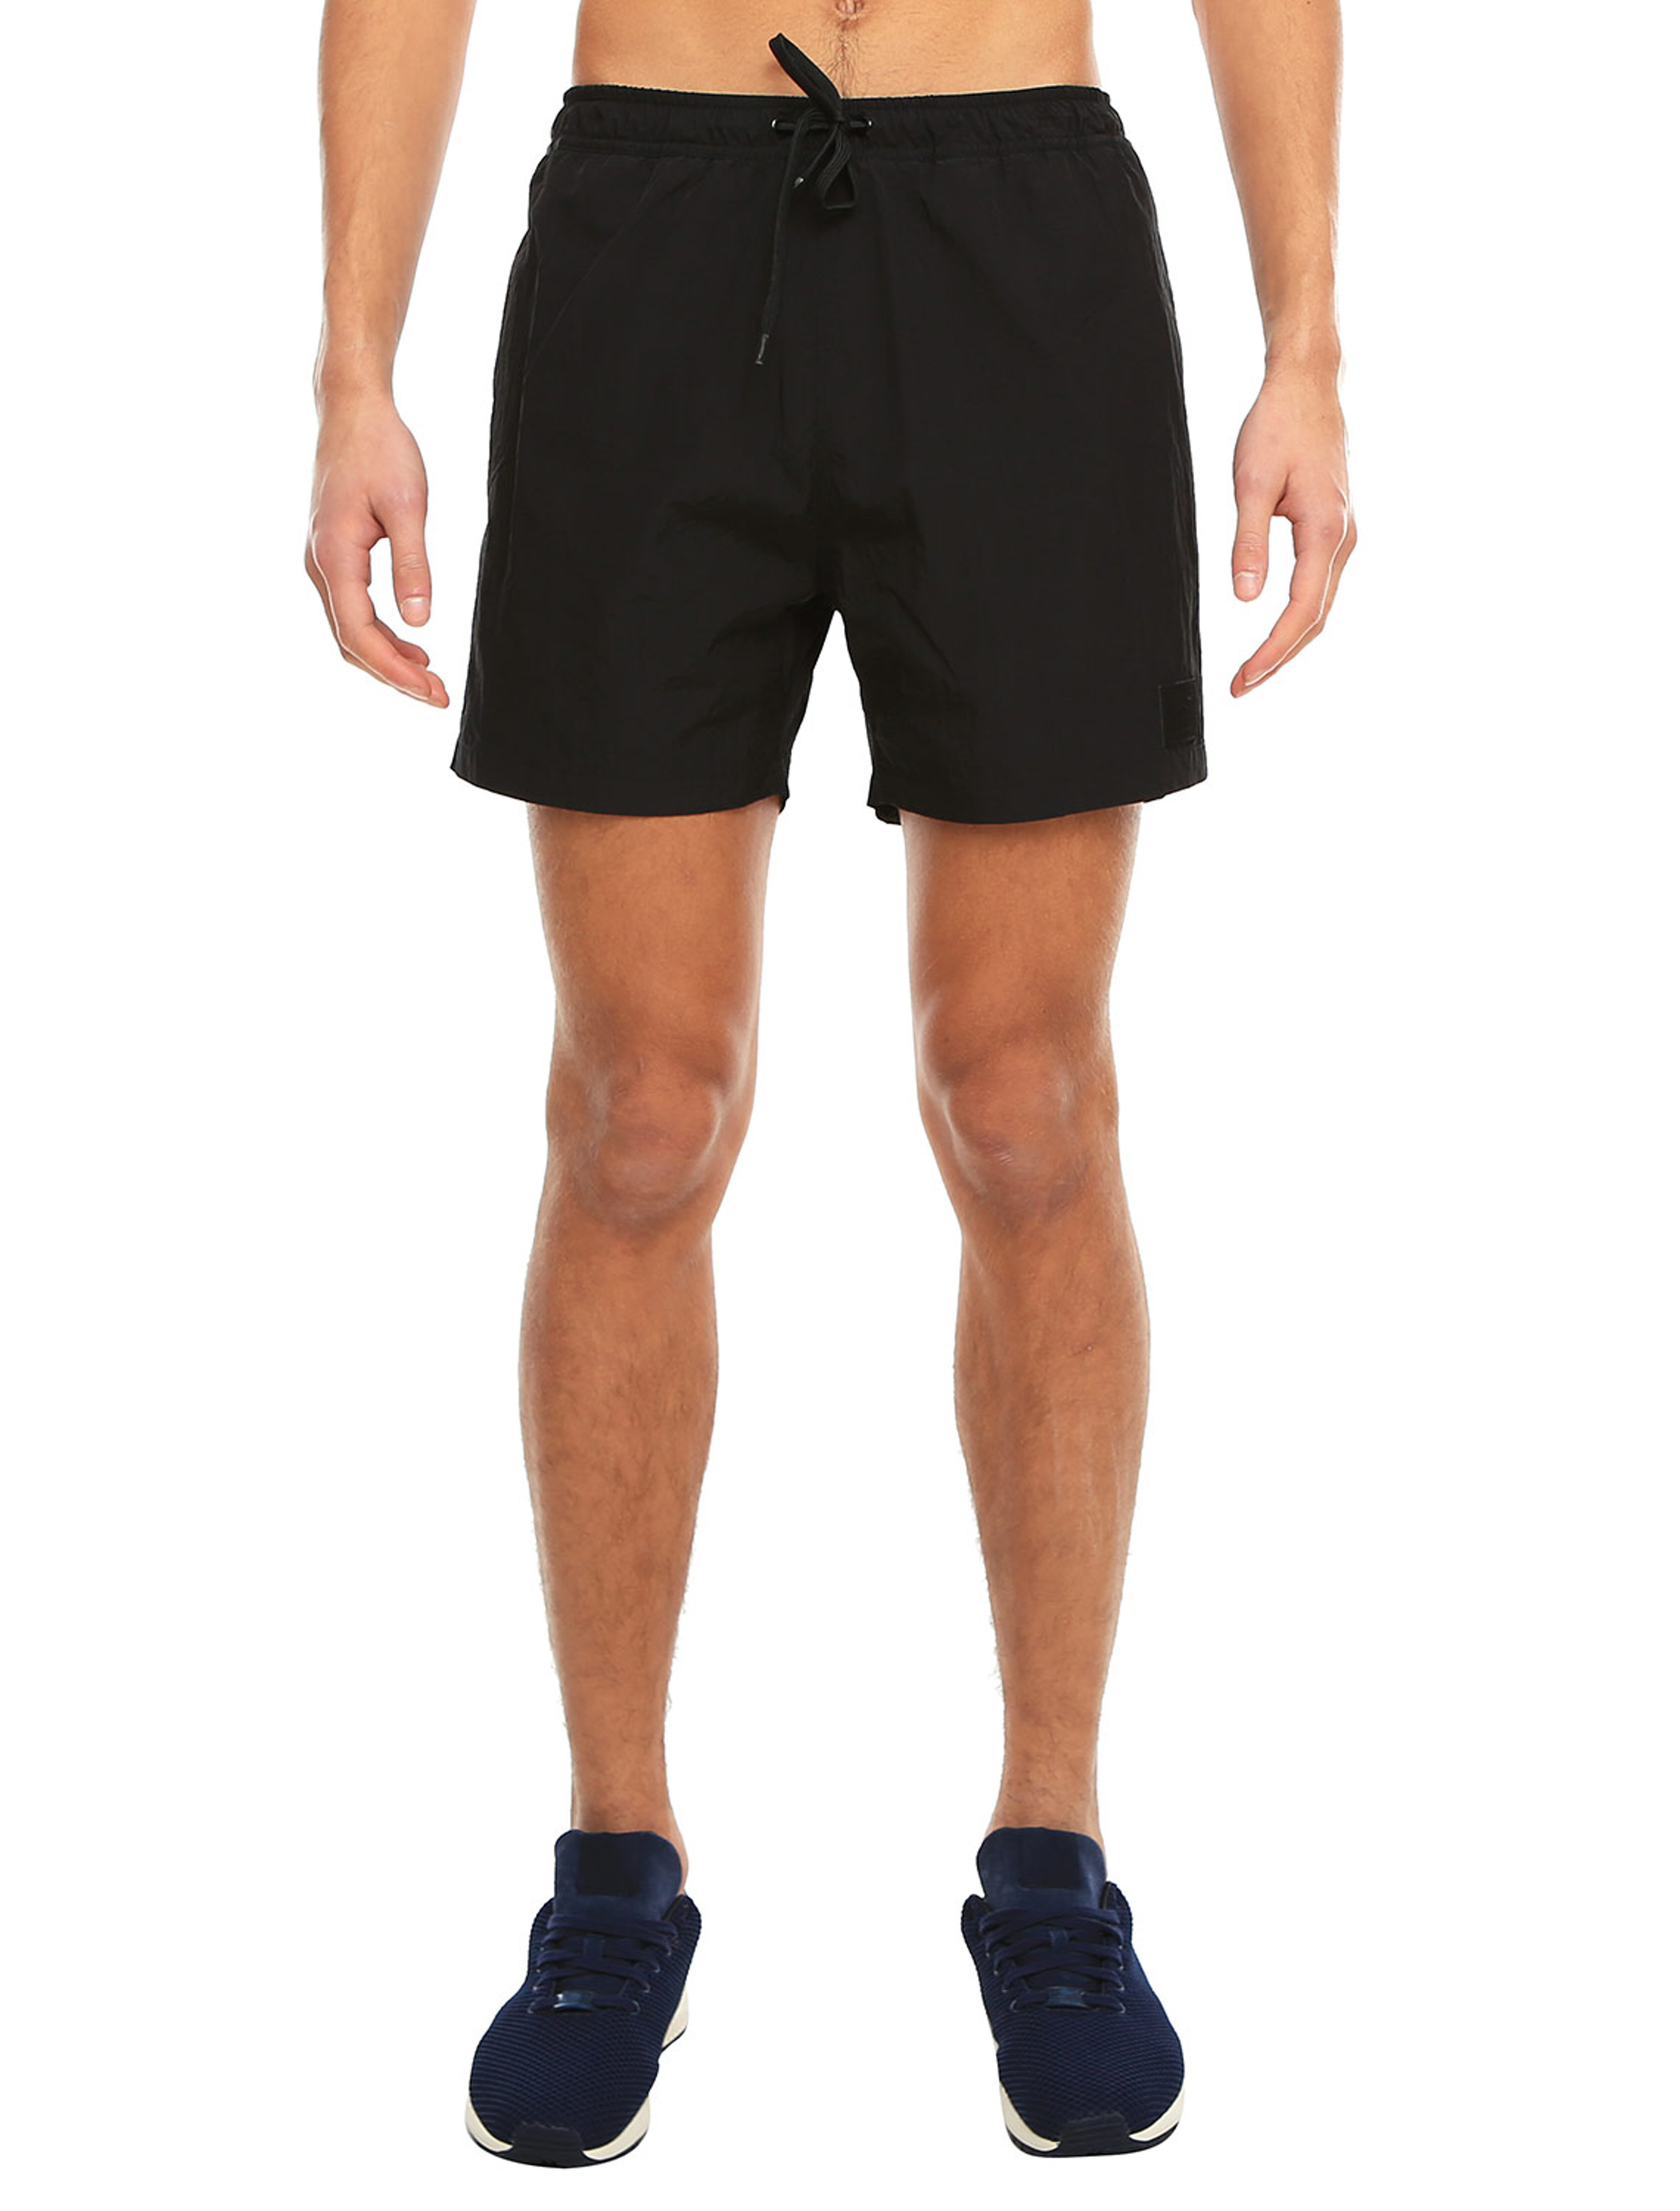 Im OnlineshopIriedaily Shorts Für Männer Offiziellen 4qRL3Ac5j